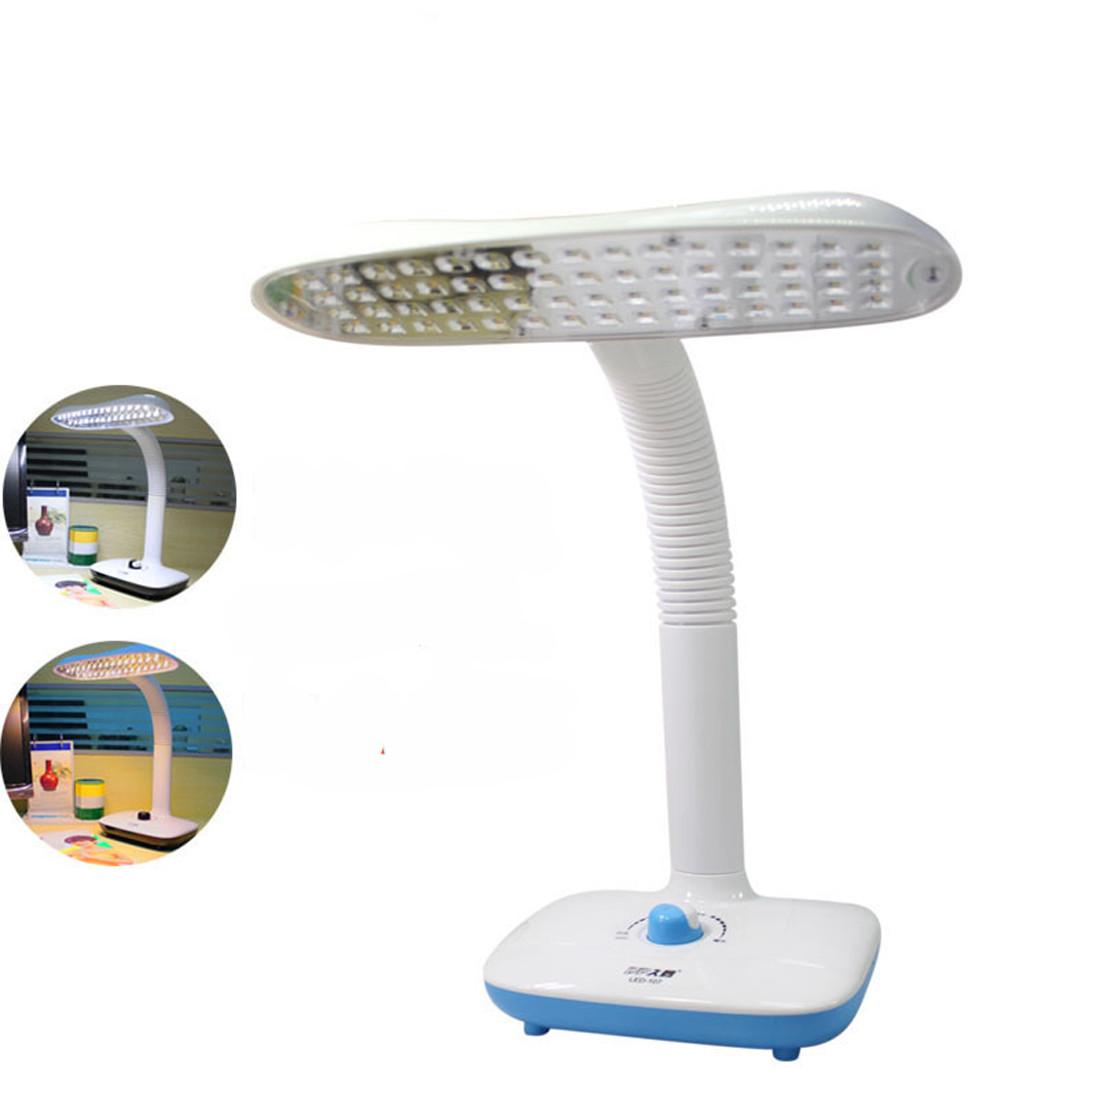 Portable Luminaire Desk Lamps Hostgarcia – Portable Luminaire Desk Lamps